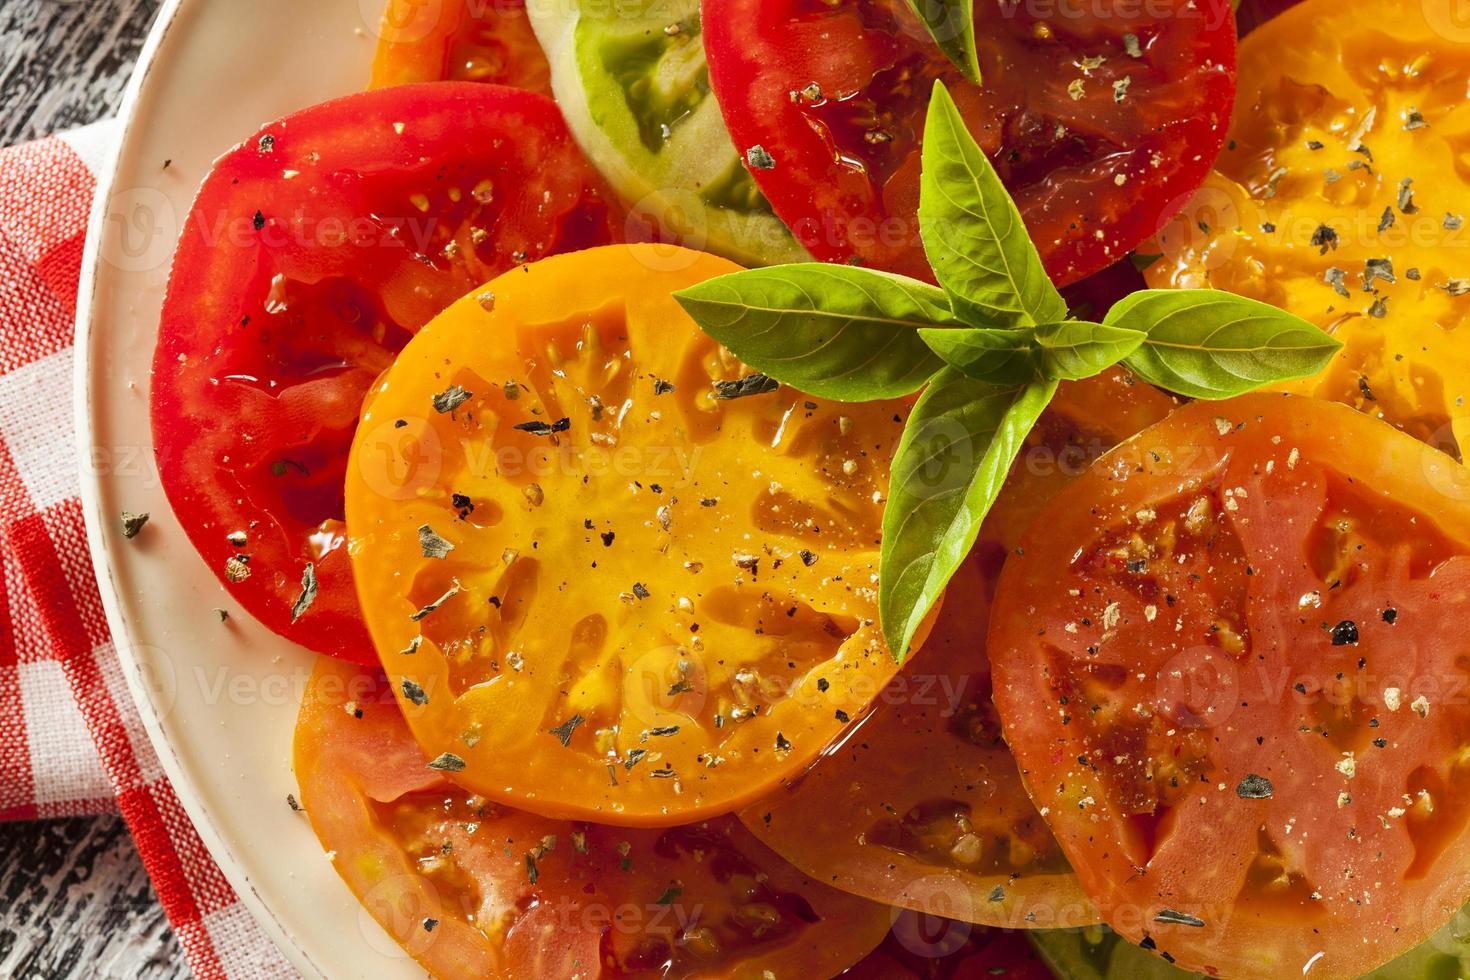 salade de tomates patrimoniale saine photo